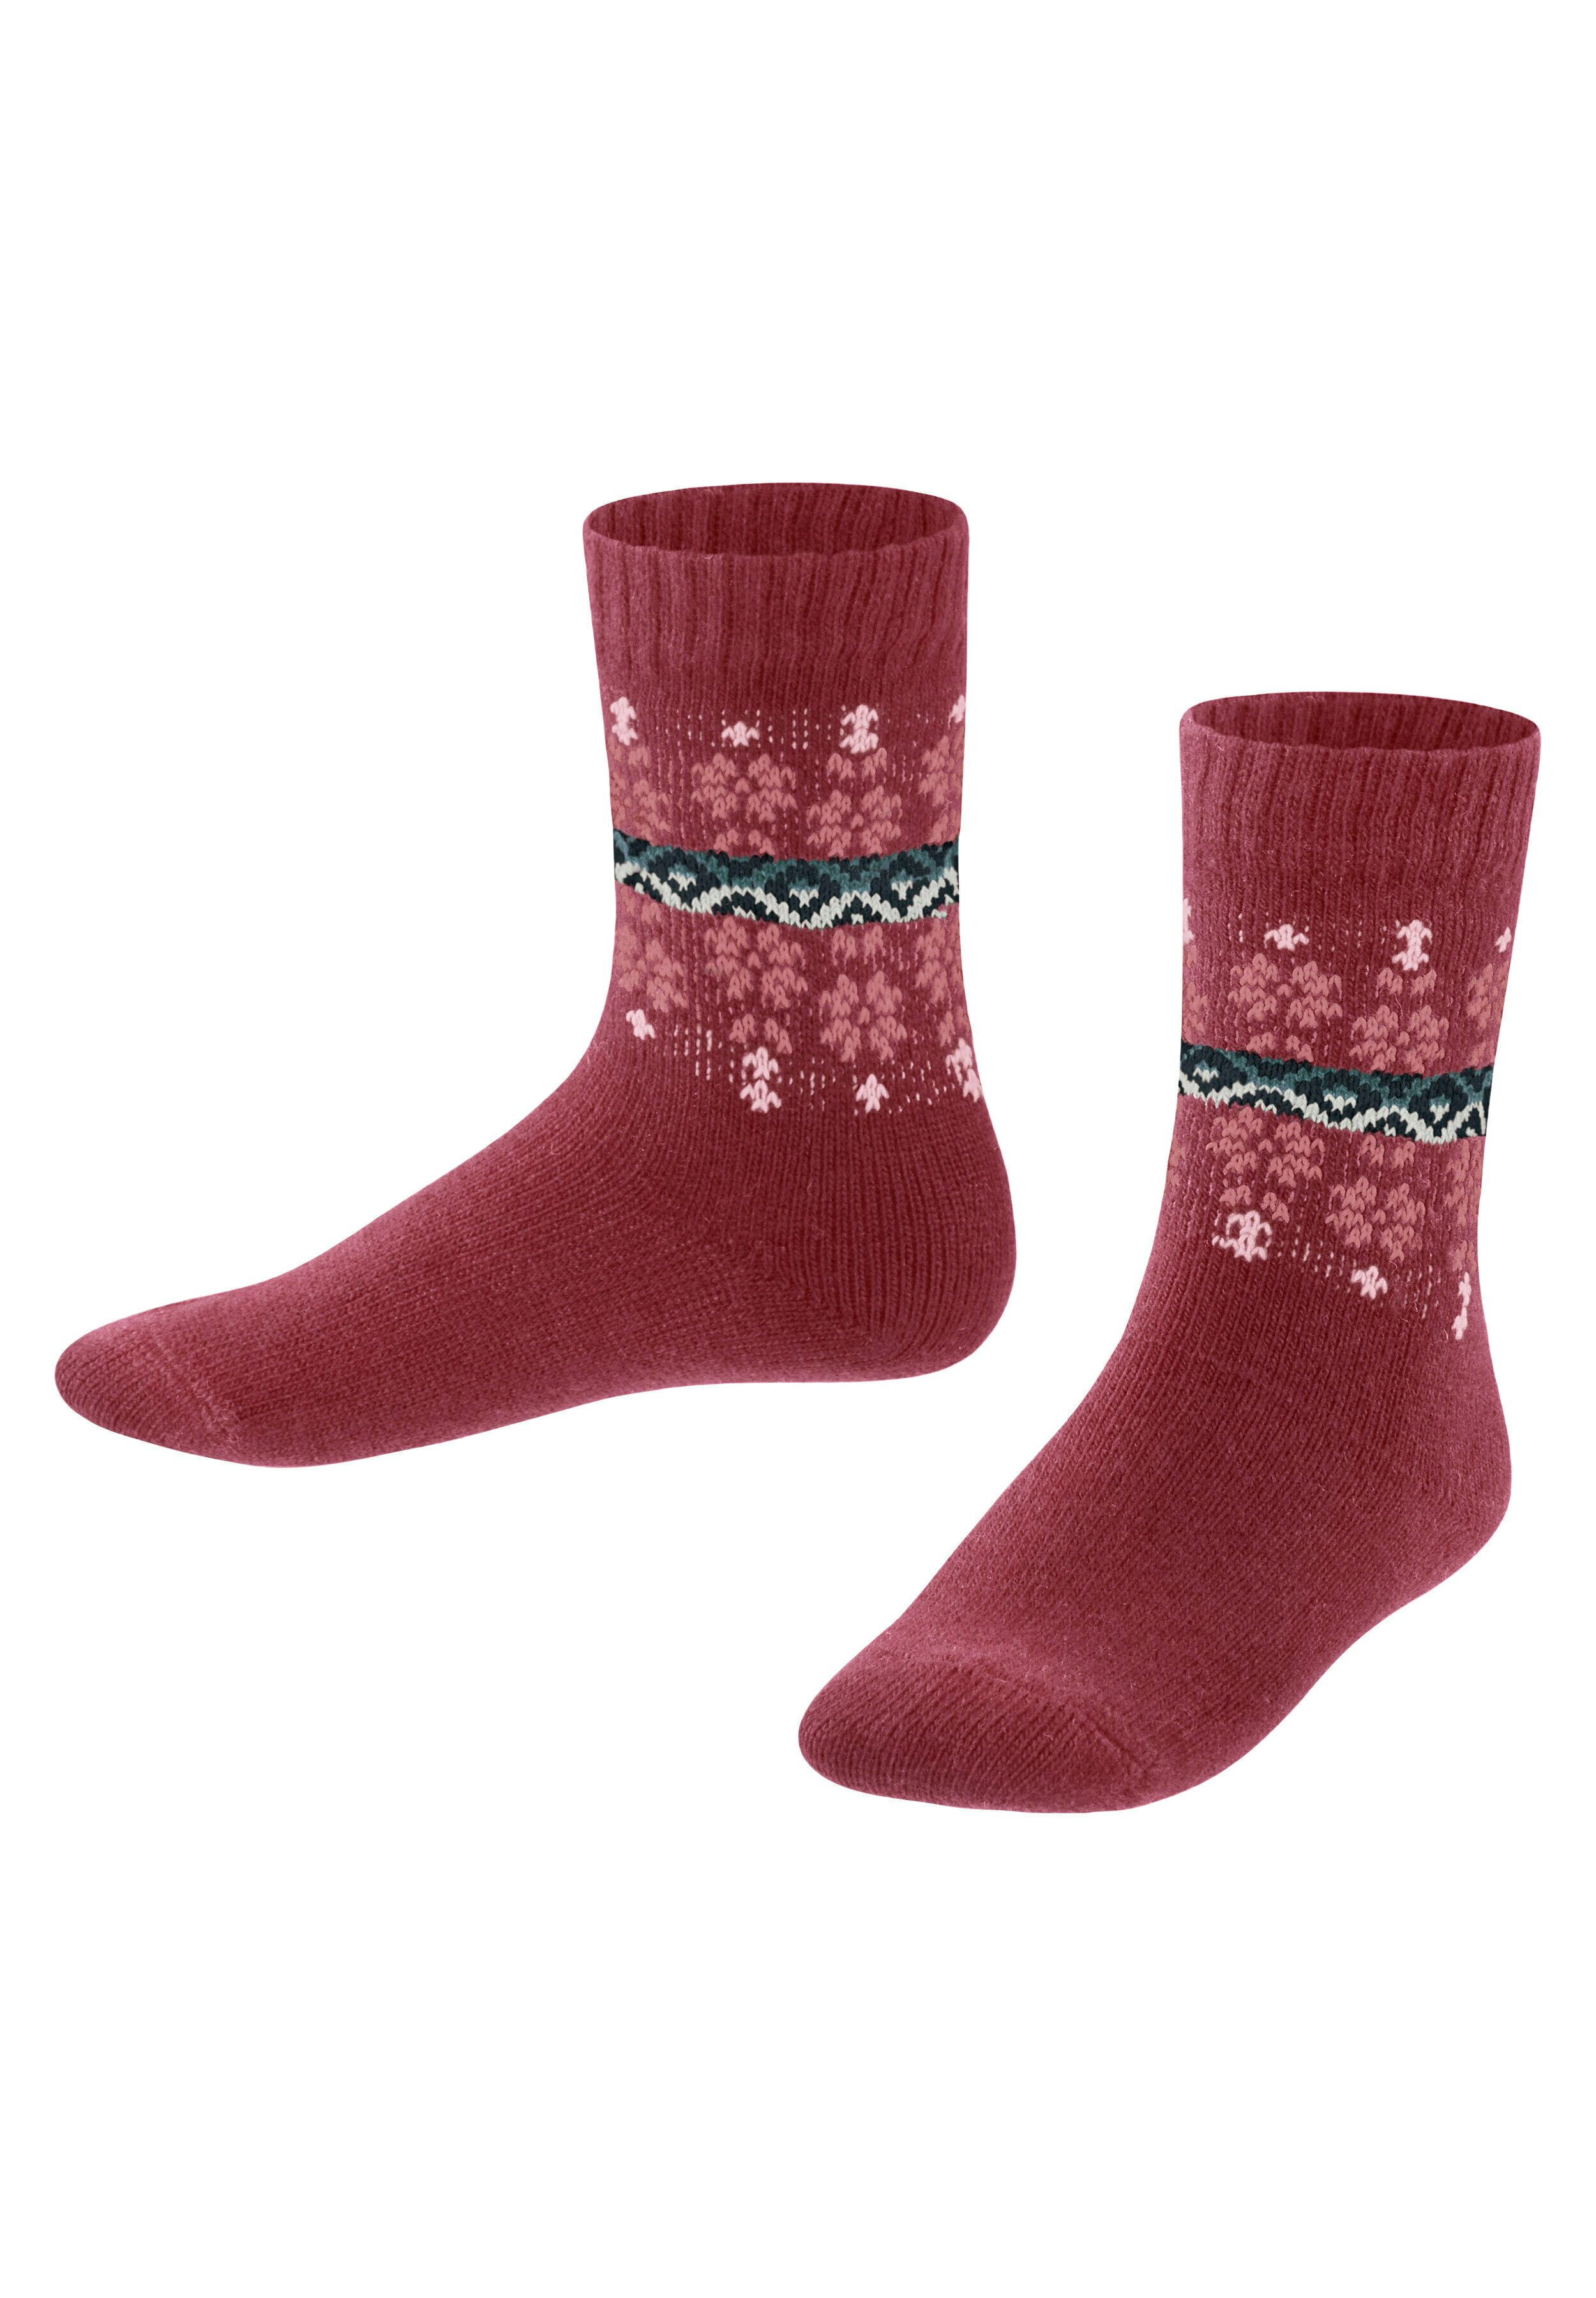 Kinder Socken - ruby